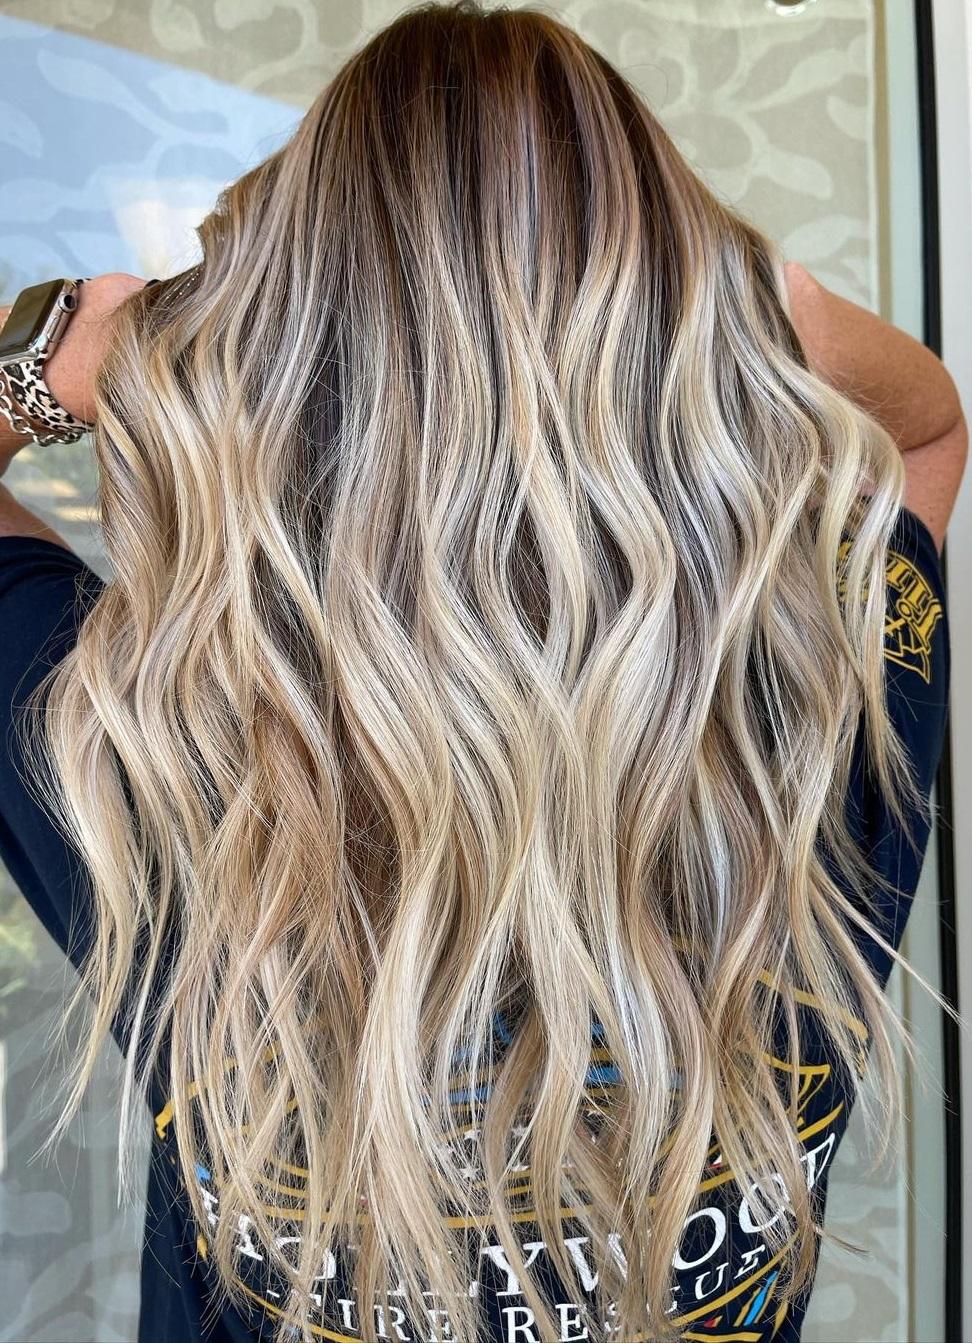 Long Blonde Balayage Hair with Waves